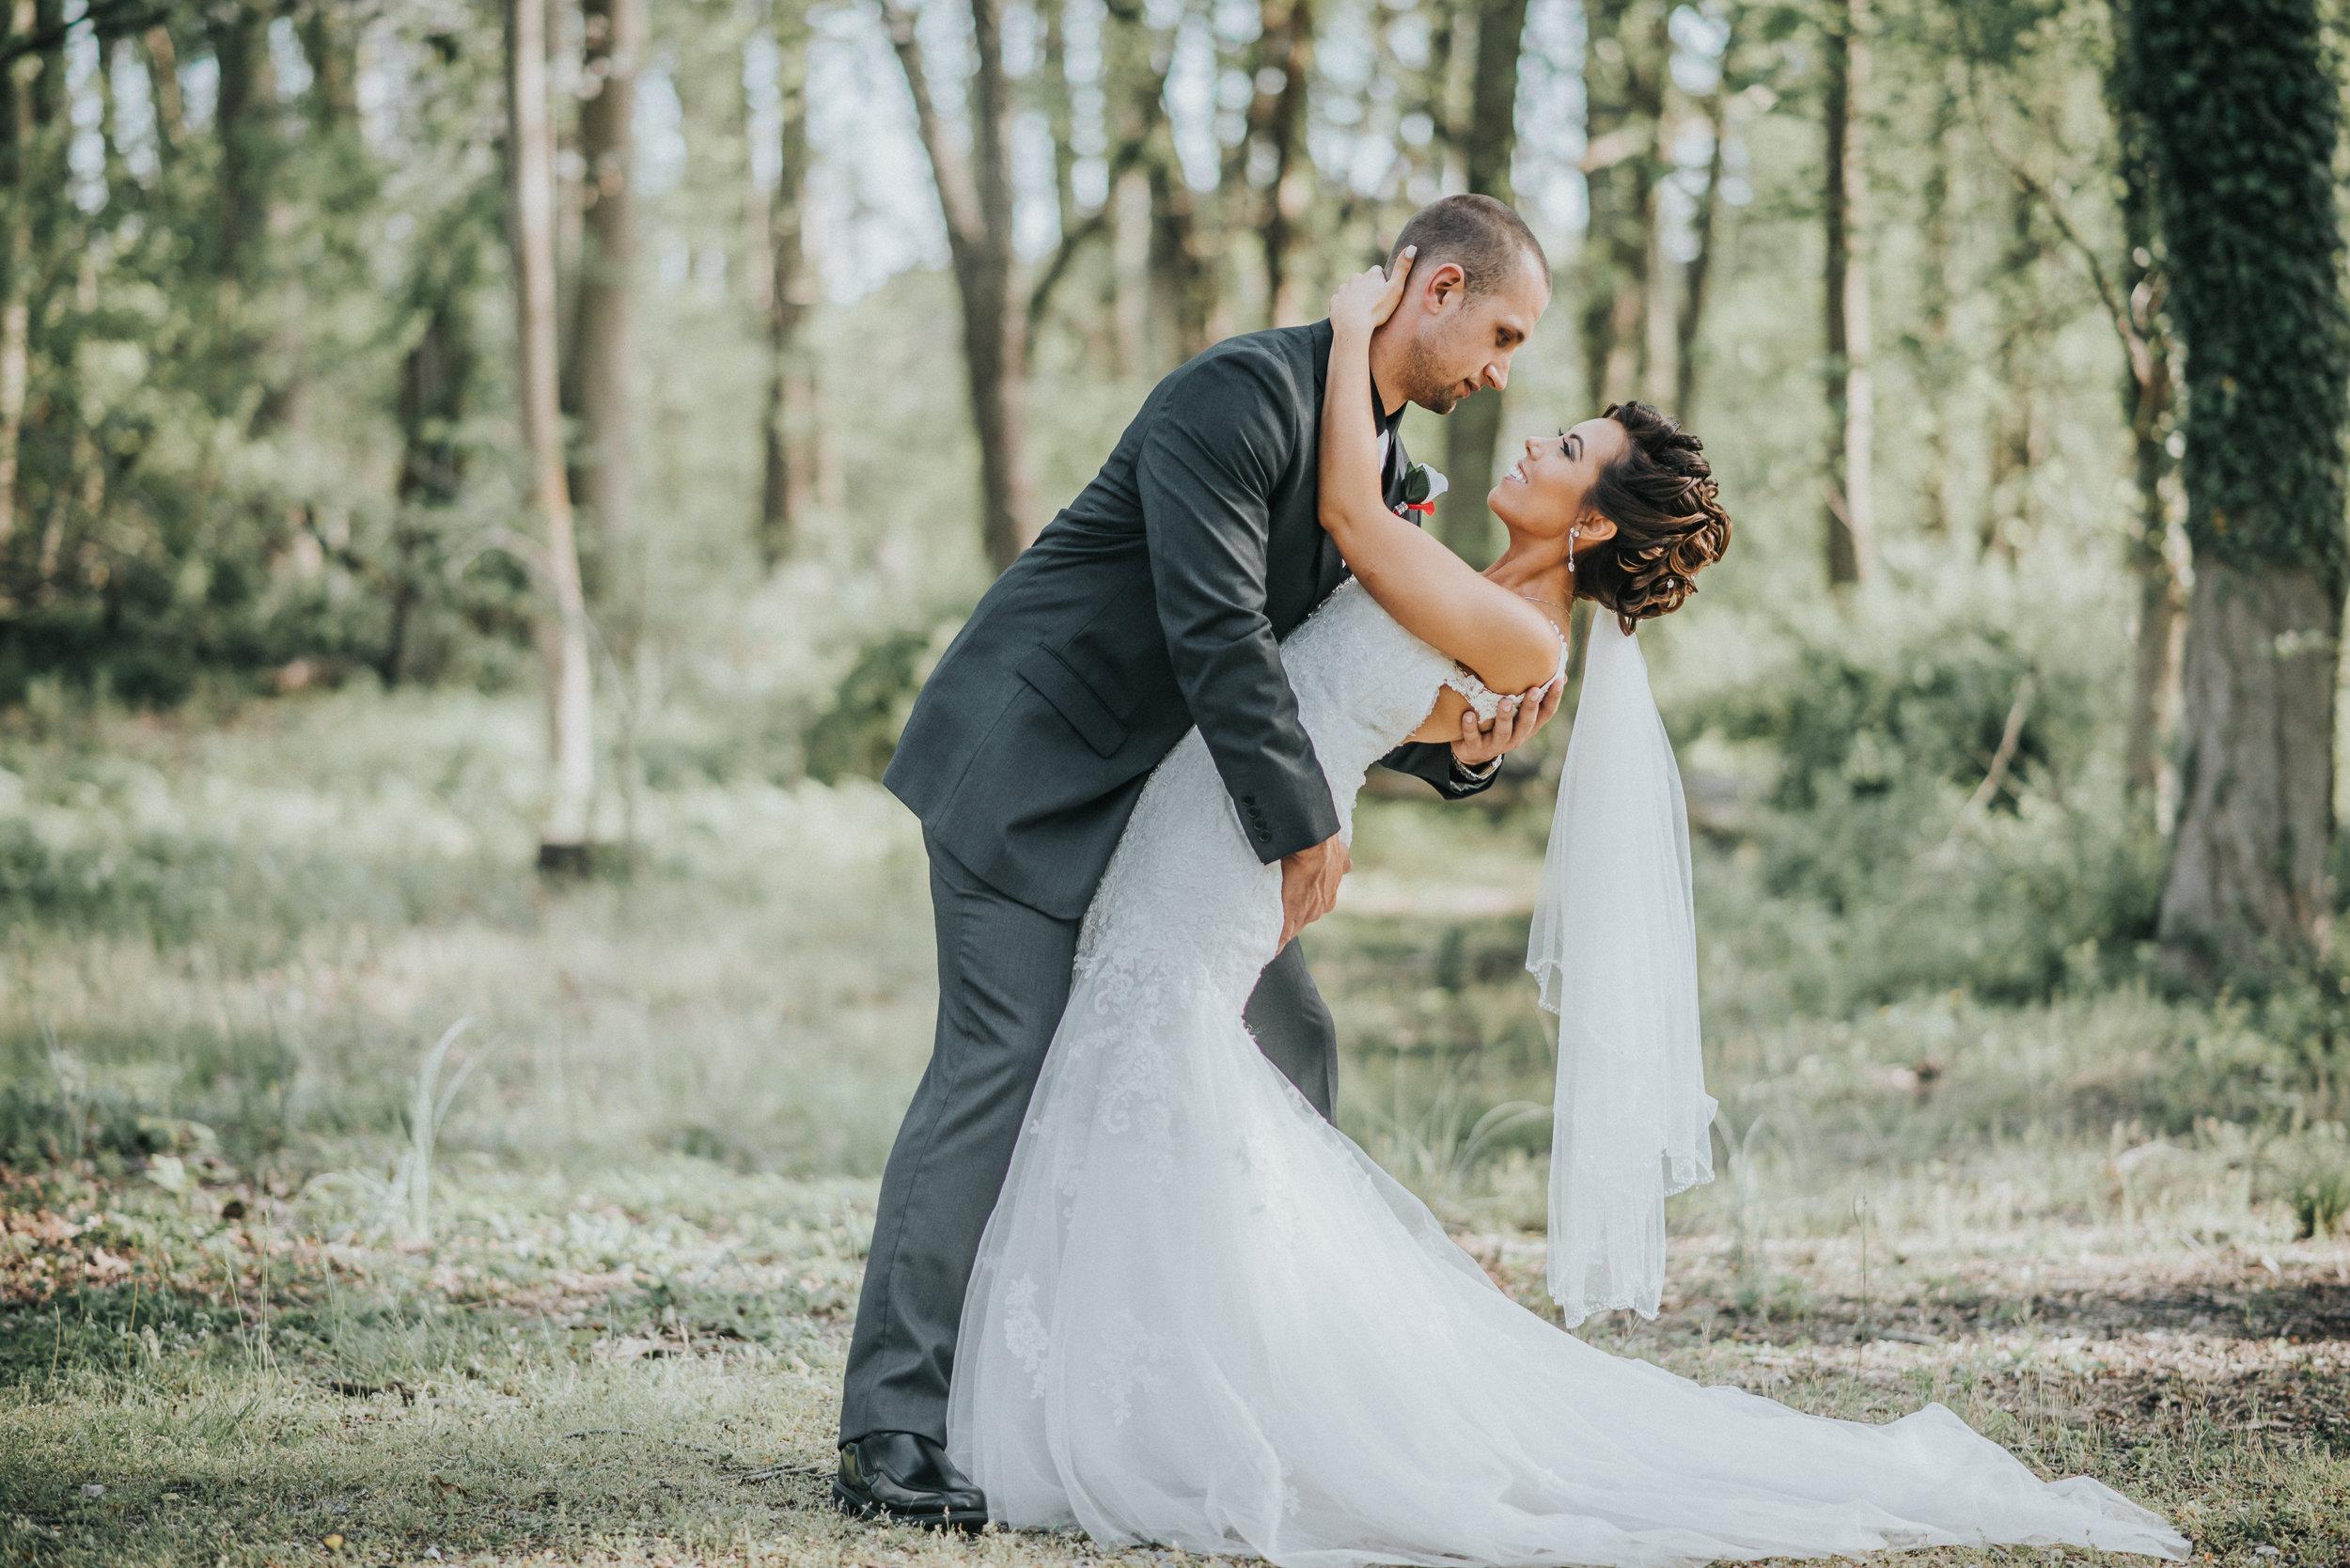 Christina-and-Gene-Wedding-Marla-Rain-Photography-214.jpg